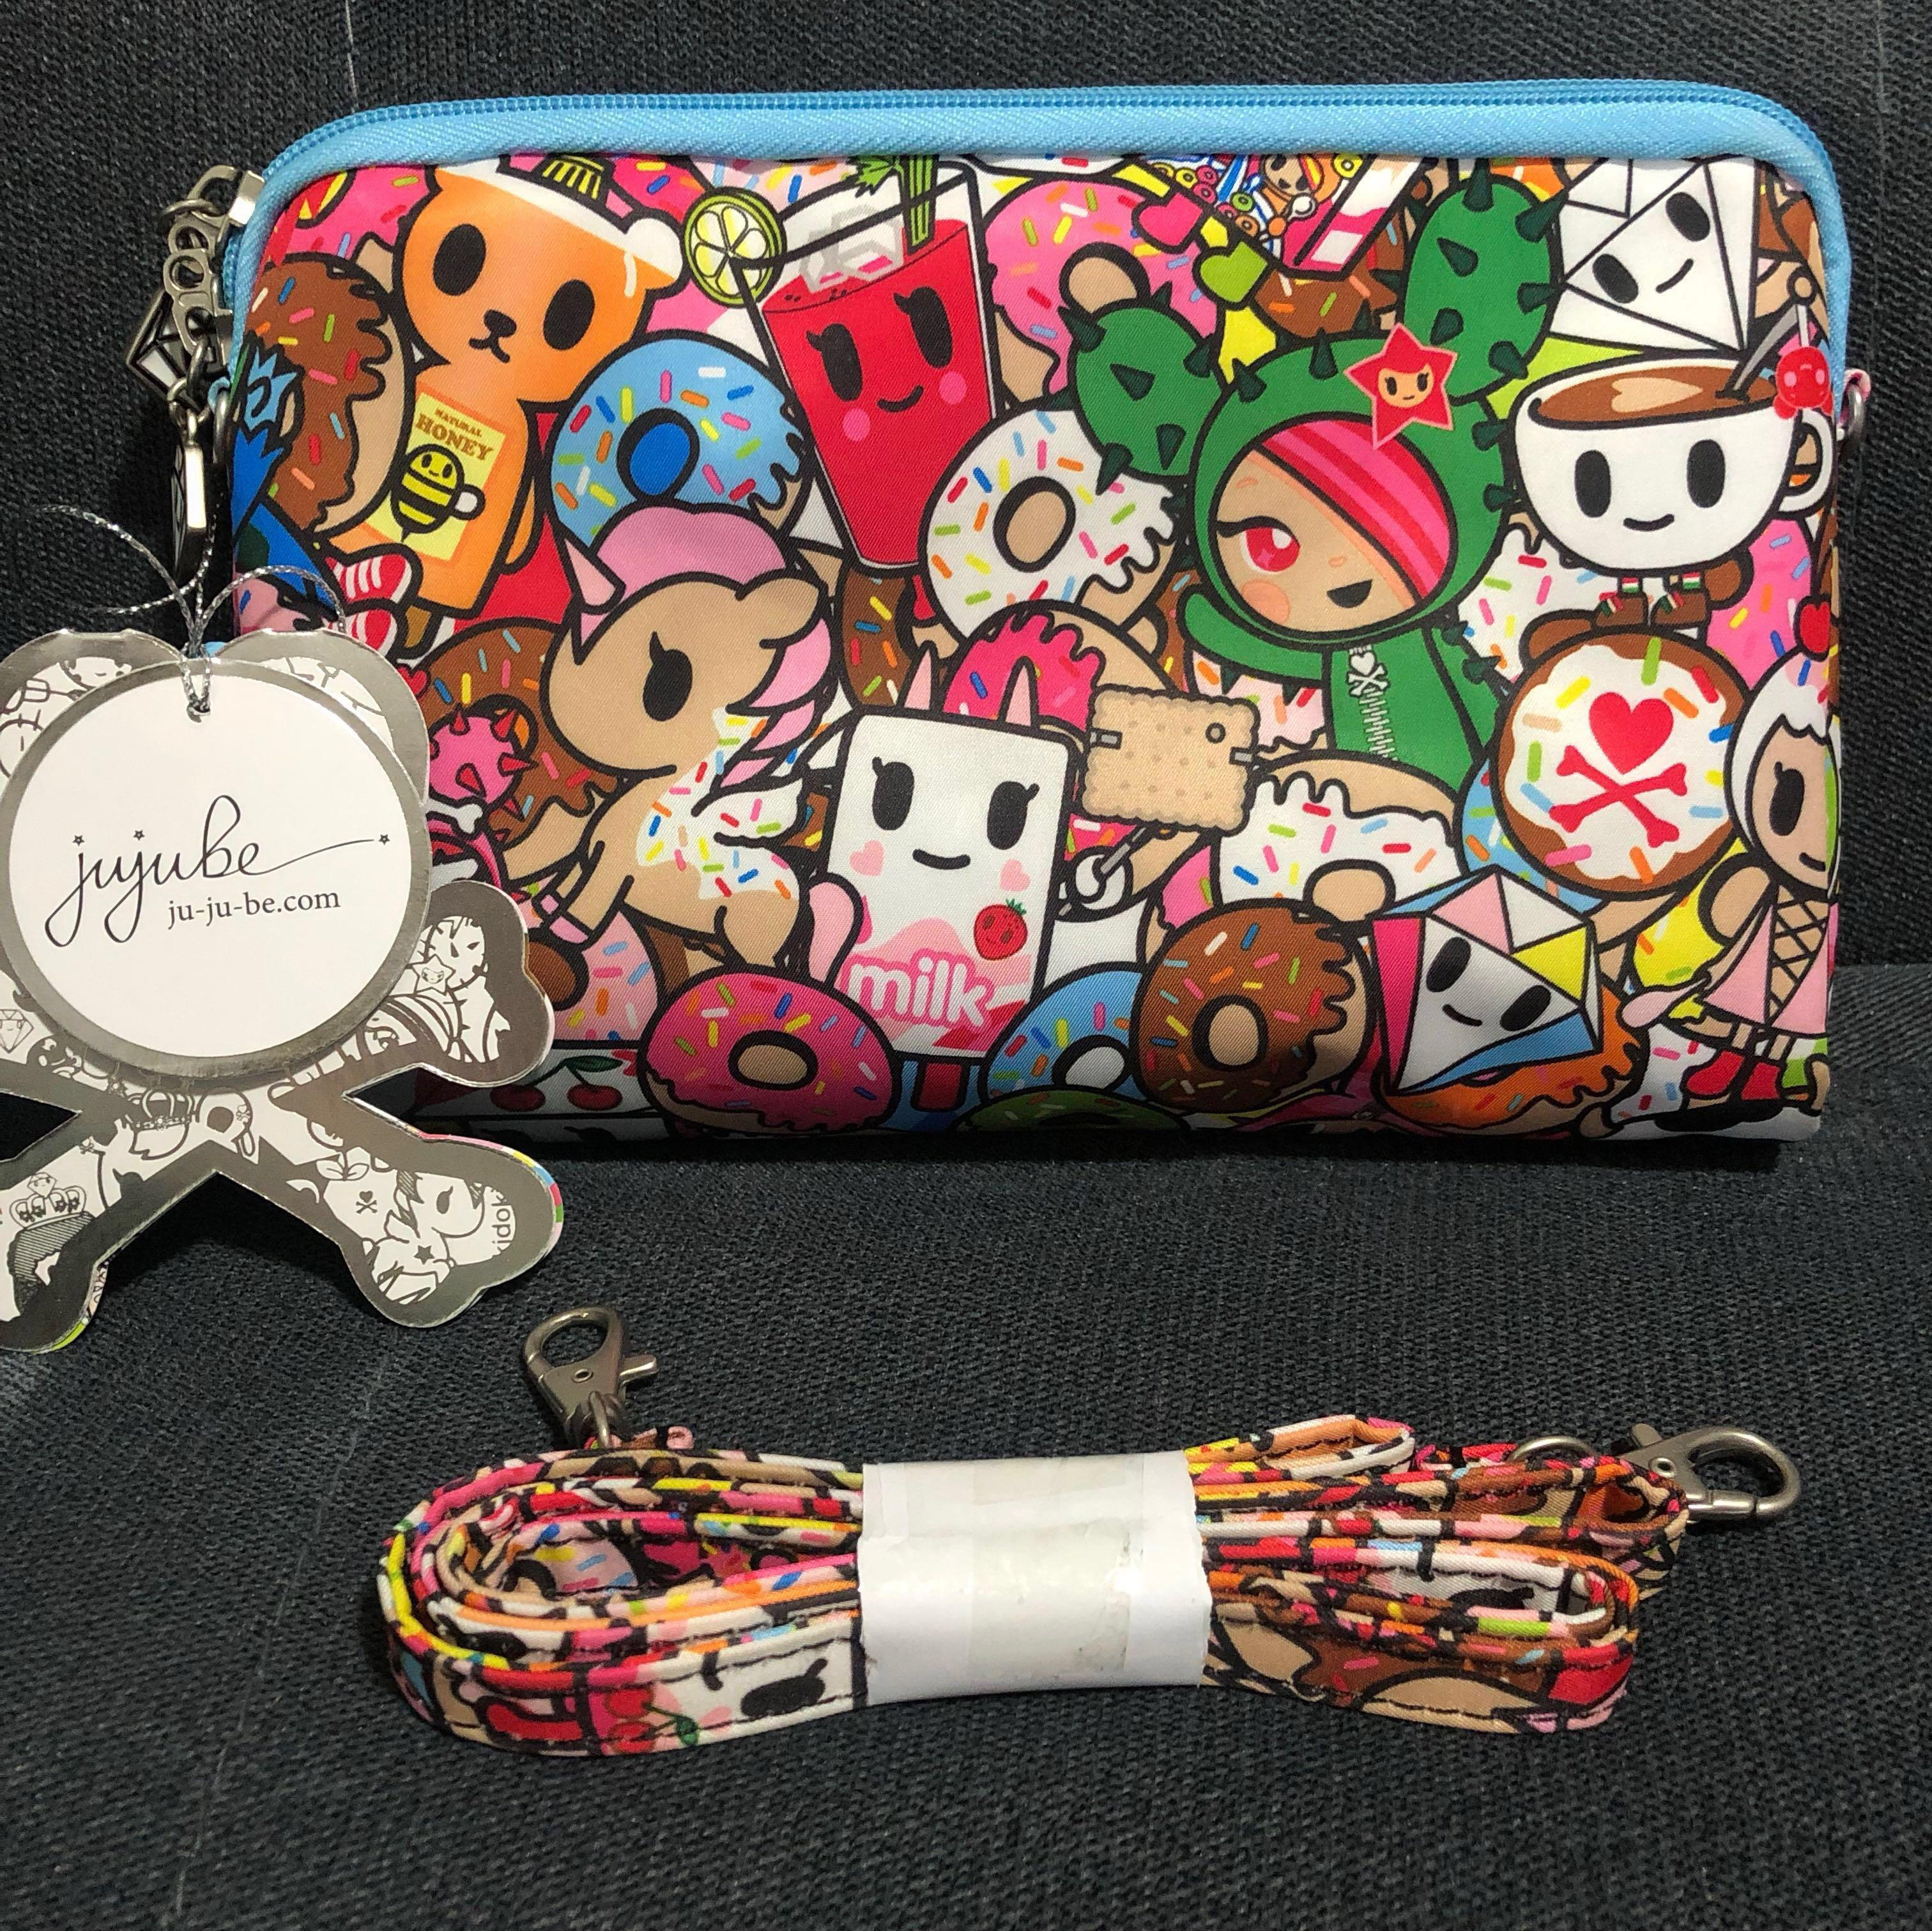 BNWT Tokidoki x Jujube Tokipops Be Set Large Bag Clutch